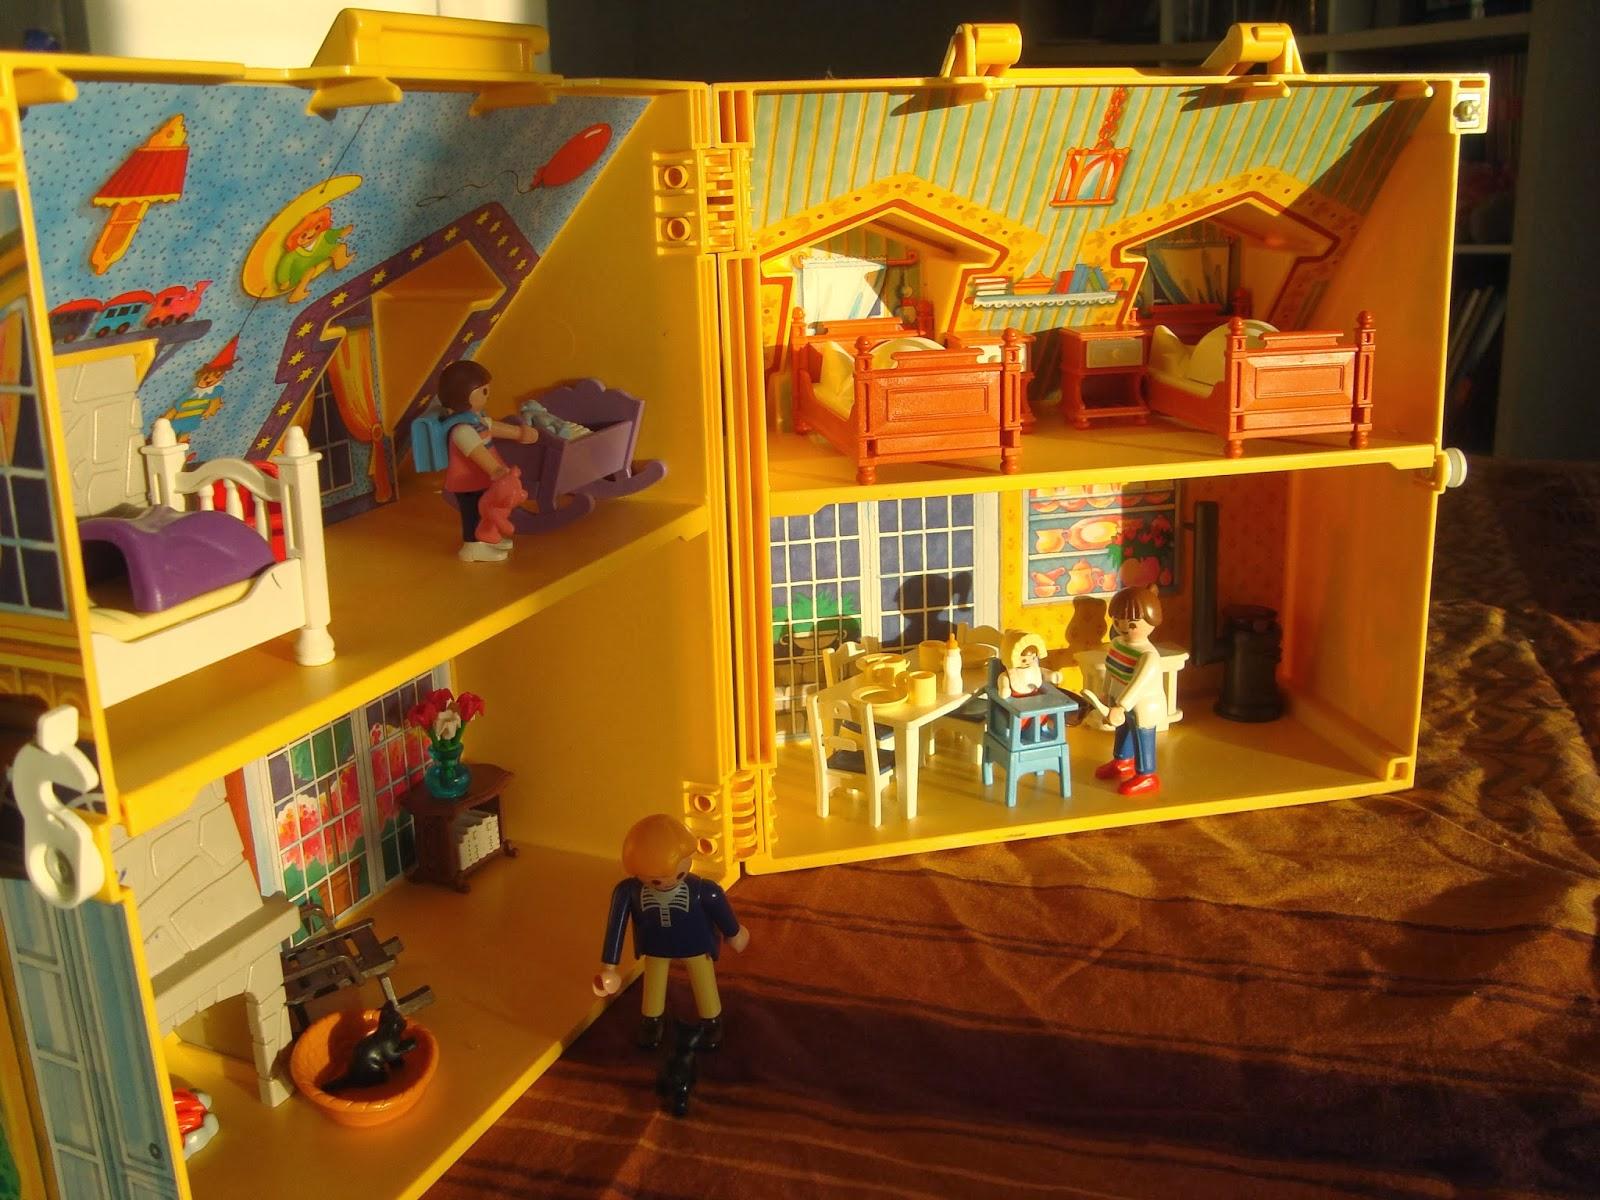 Dioramas playmobil playmobil ref 4145 diorama maison Maison transportable